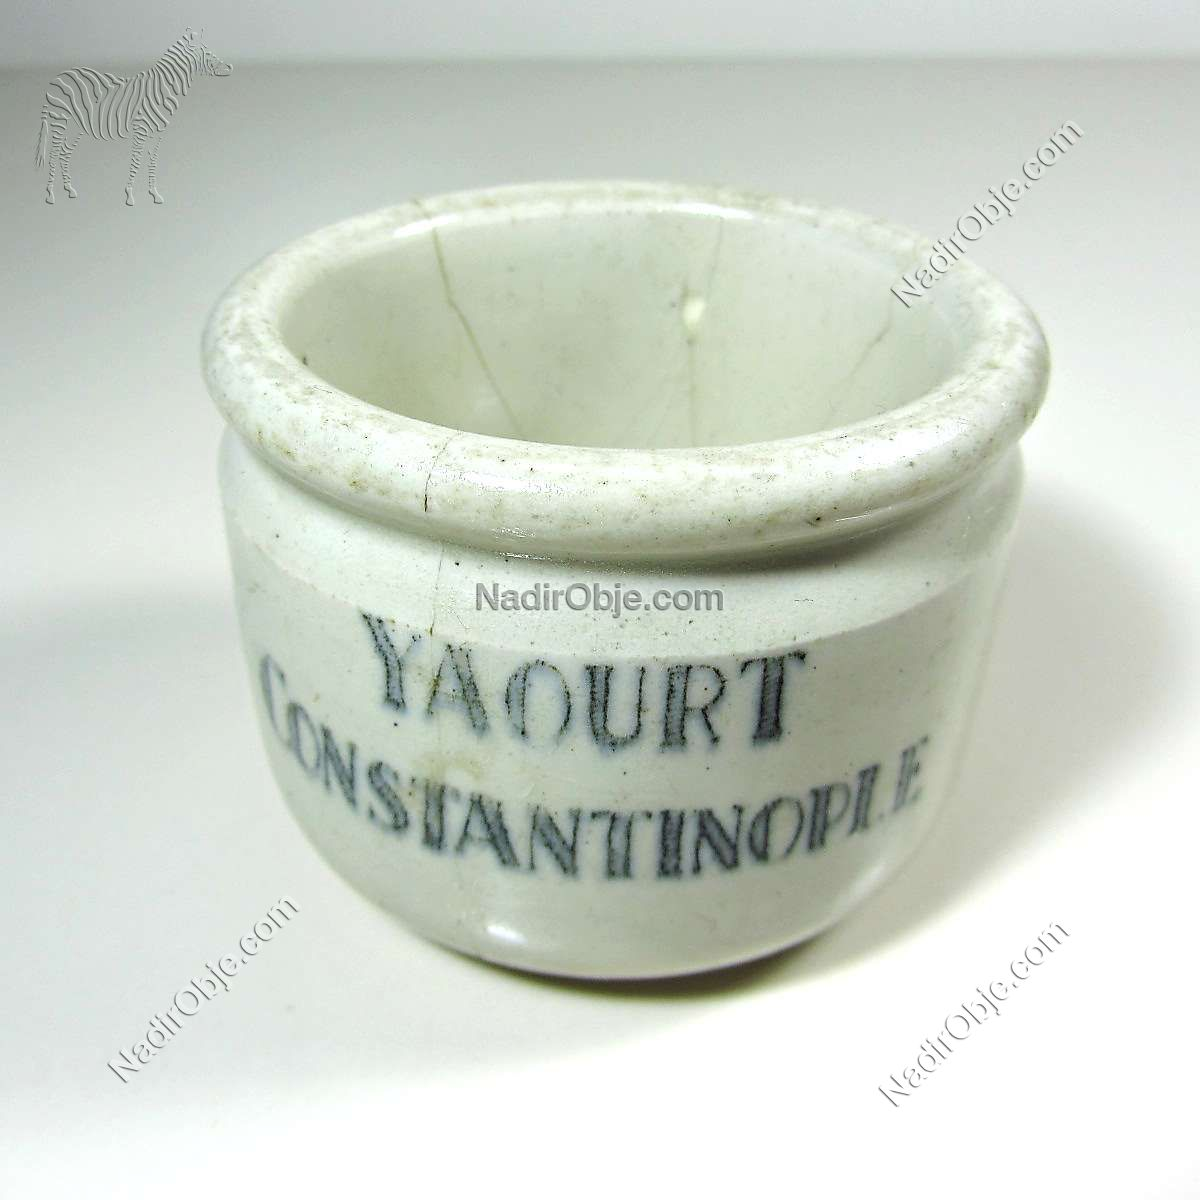 Yaourt Constantinople Seramik-Porselen Objeler Constantinople